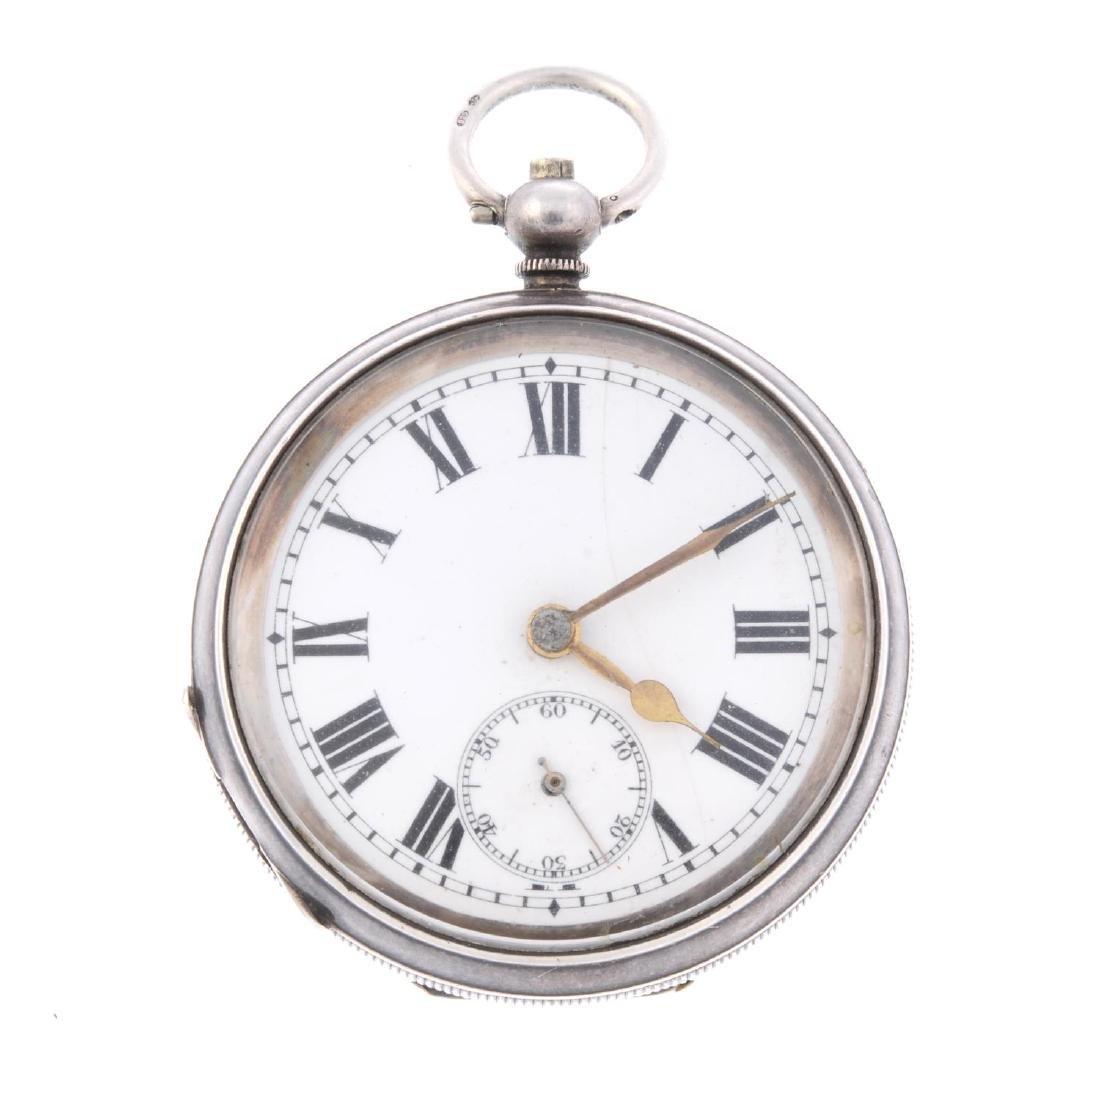 An open face pocket watch. Silver case, import hallmark